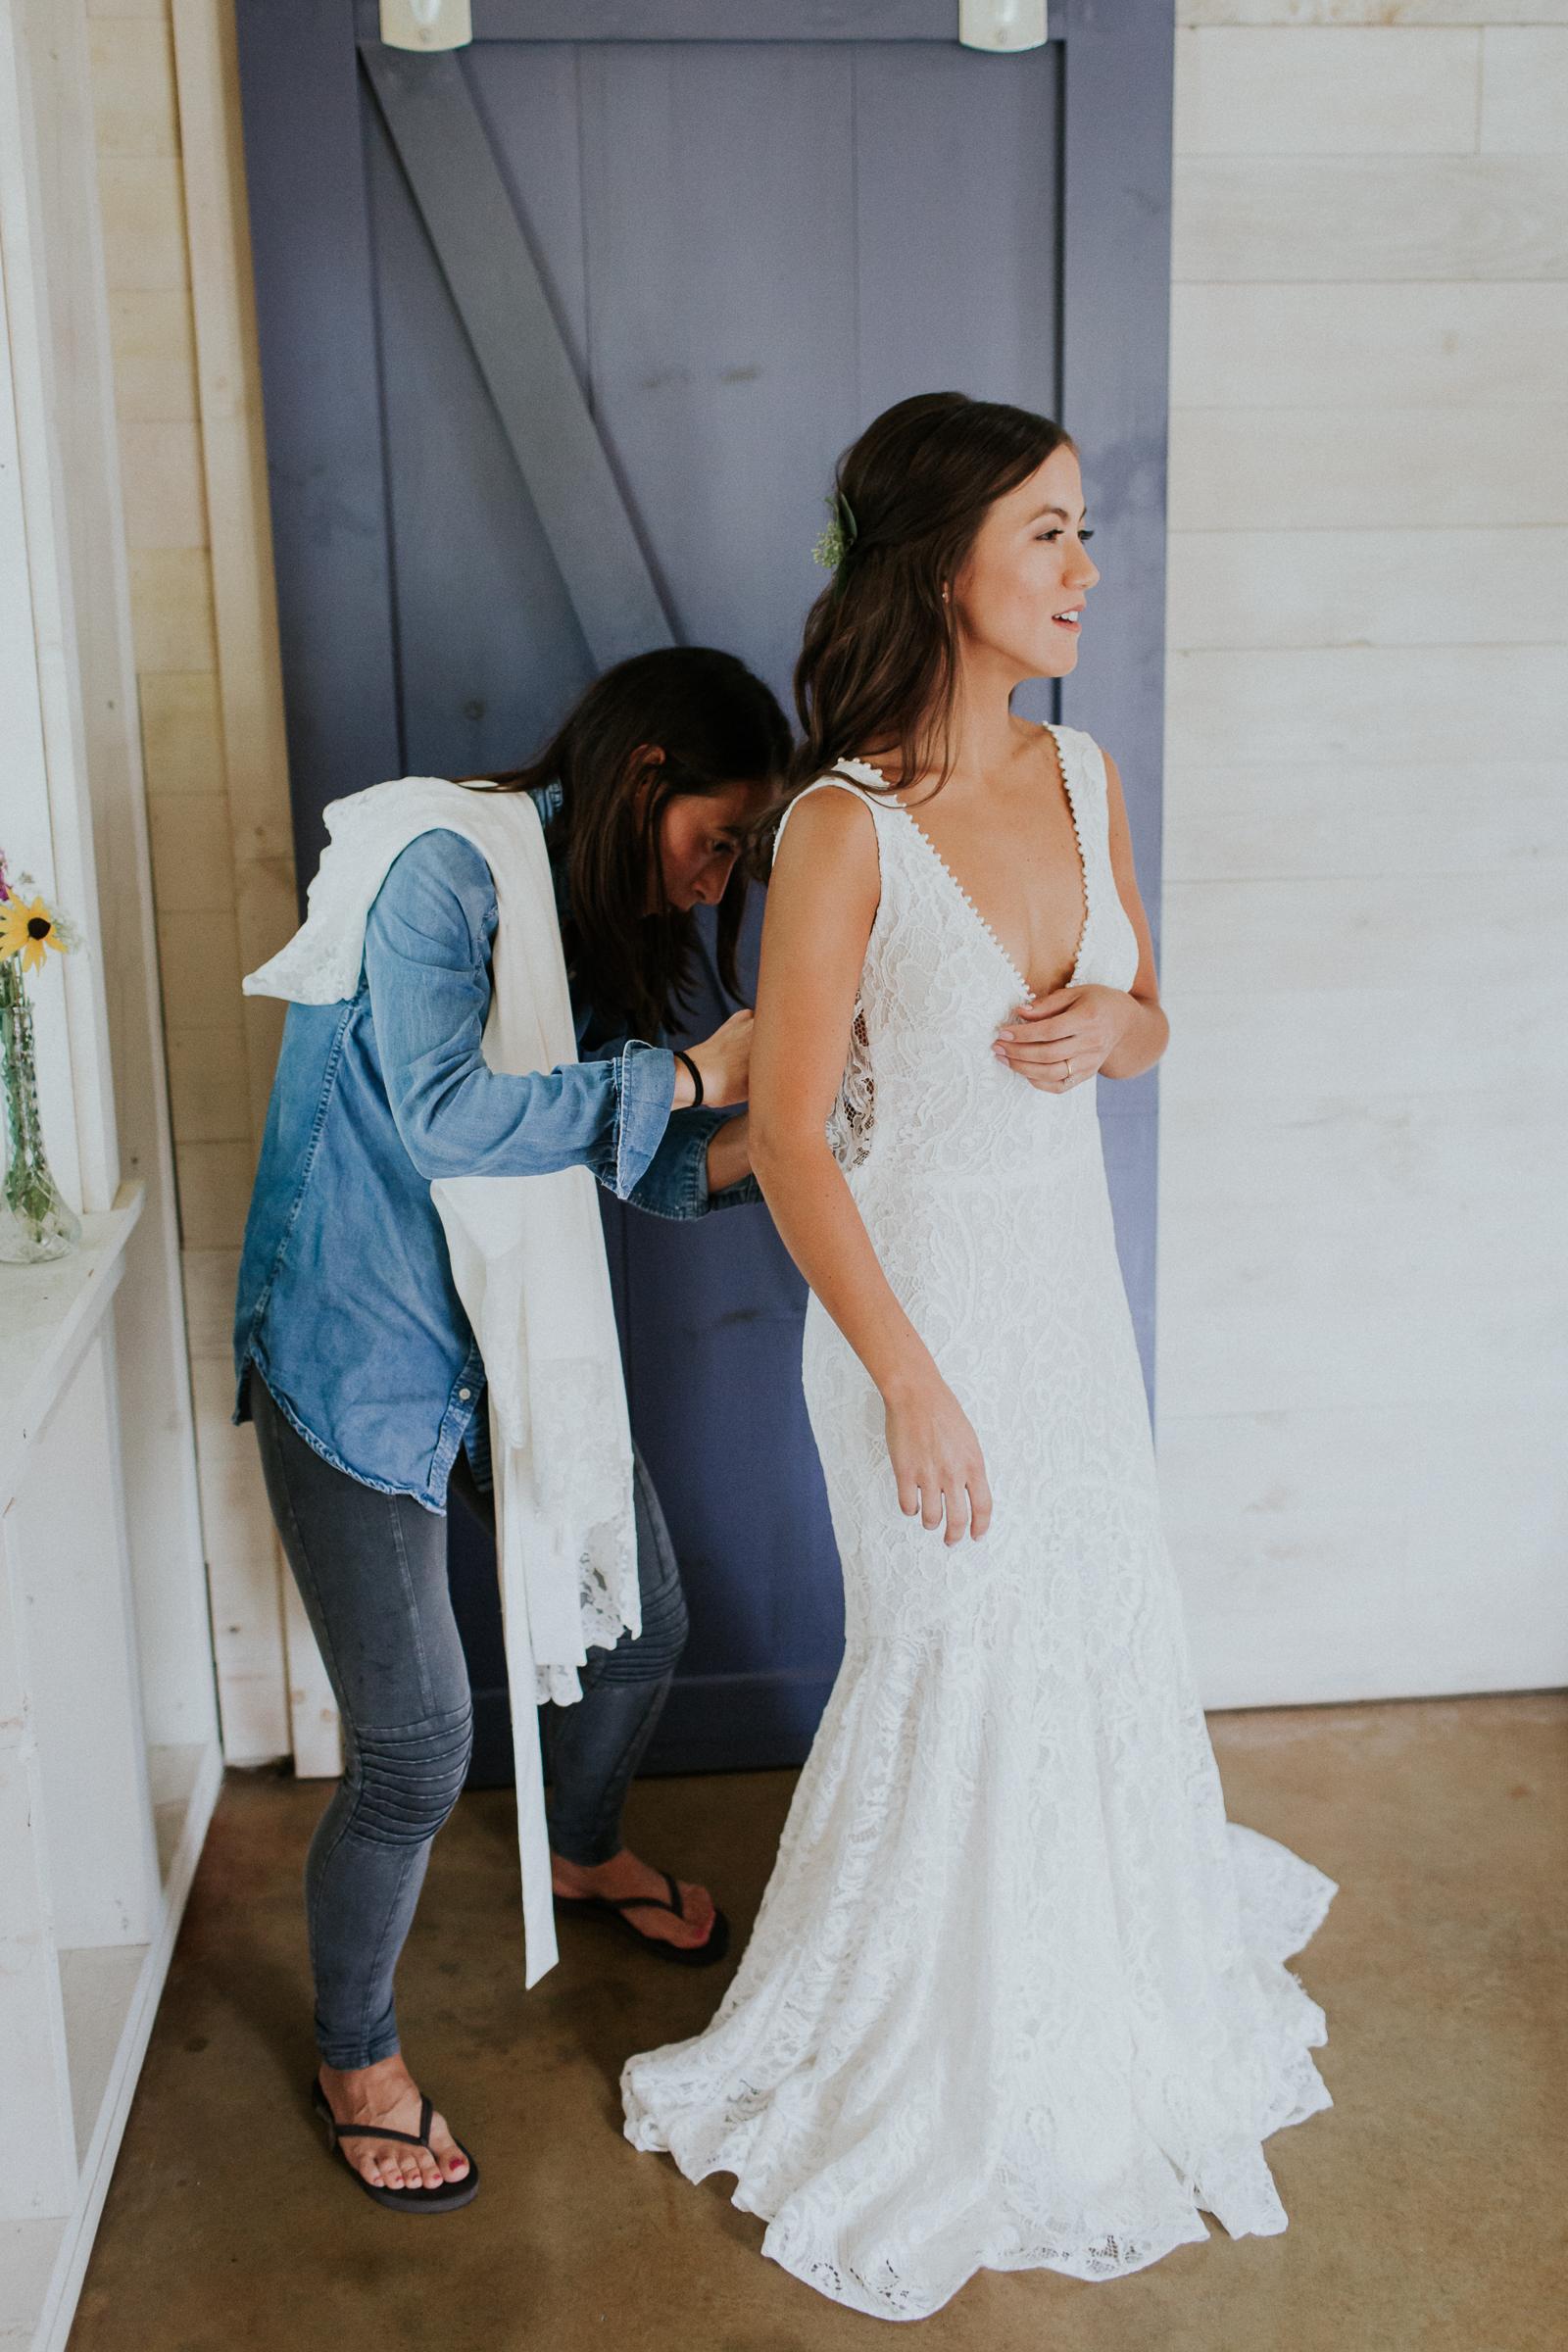 Marianmade-Farm-Wiscasset-Maine-Fine-Art-Documentary-Wedding-Photographer-Elvira-Kalviste-Photography-15.jpg